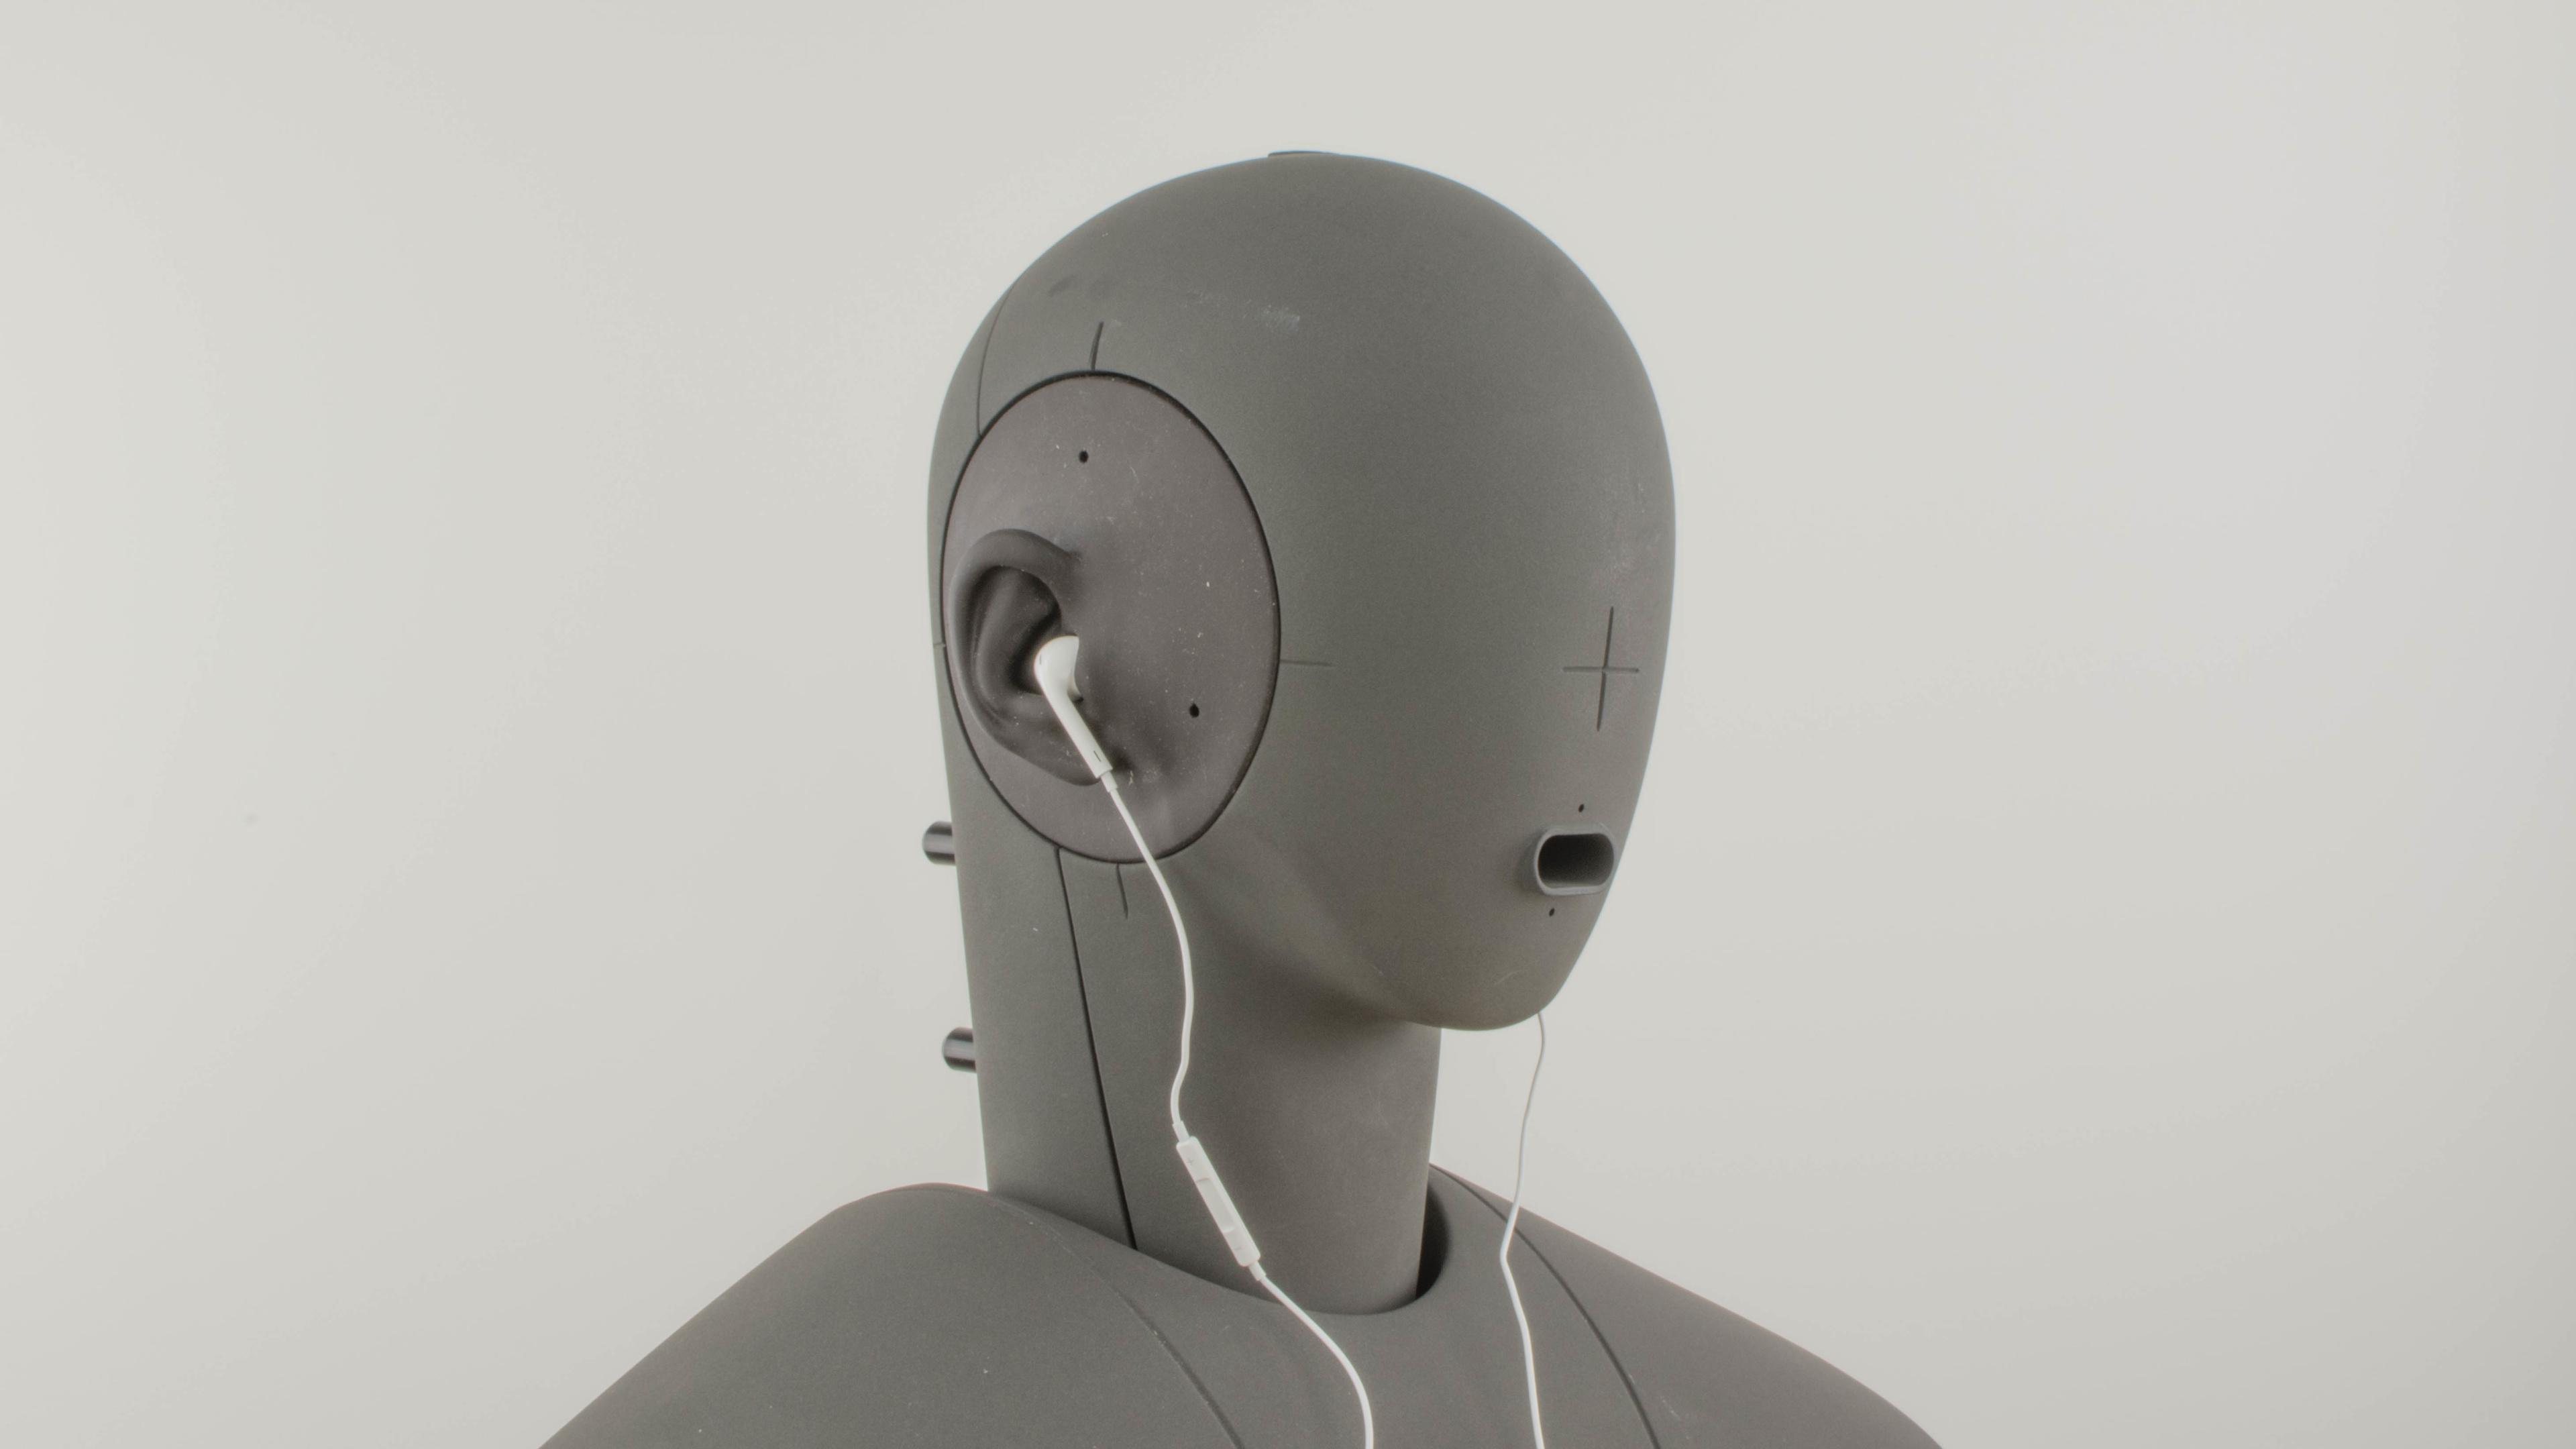 Apple Earpods Vs 1more Triple Driver In Ear Side By Comparison Wire Diagram Design Picture 2